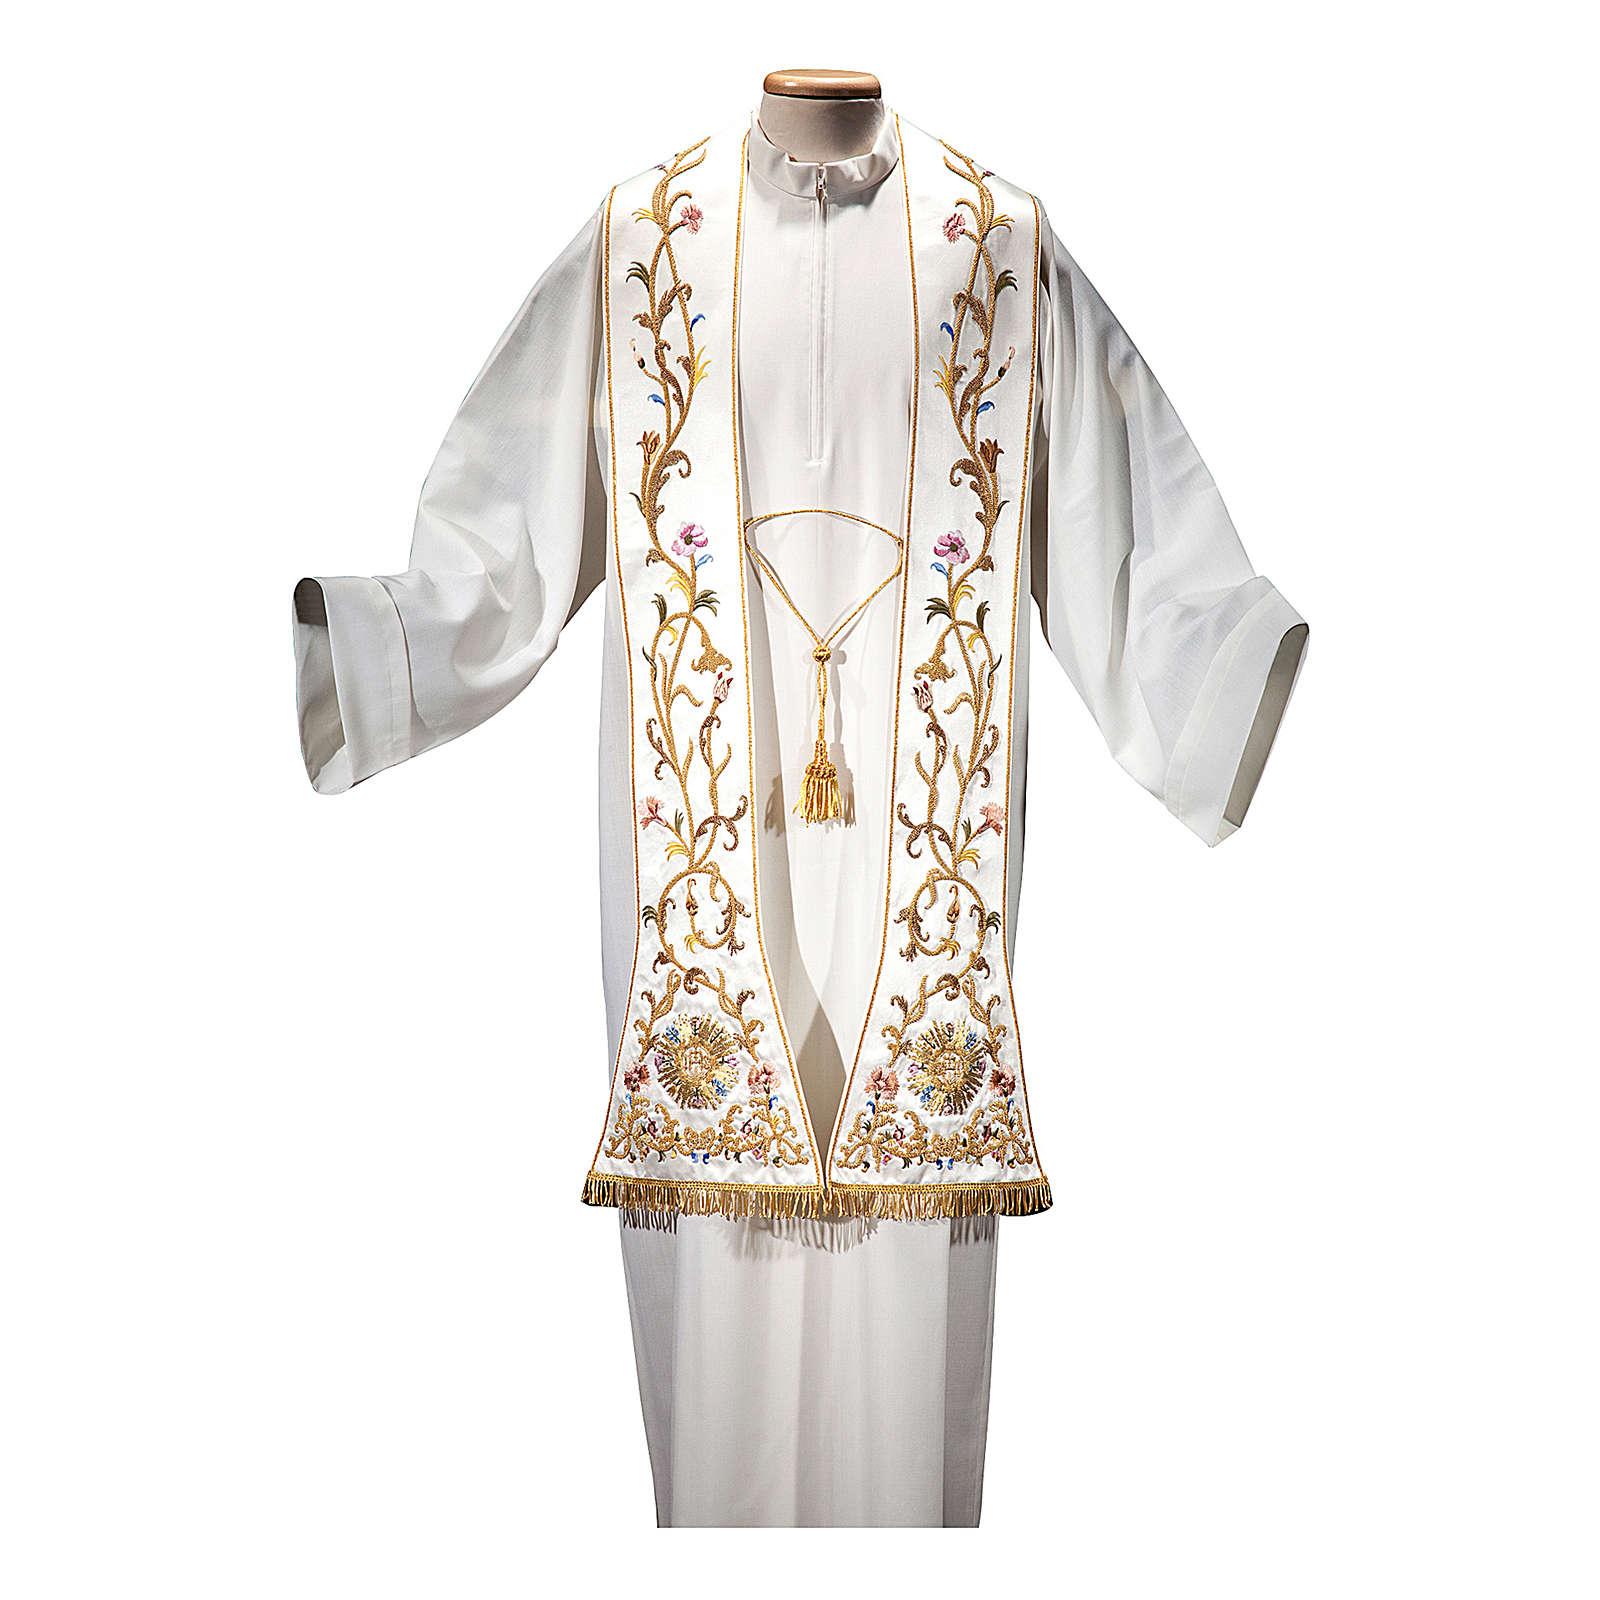 Estola romana seda algodón con fleco dorado BORDADO A MANO 4